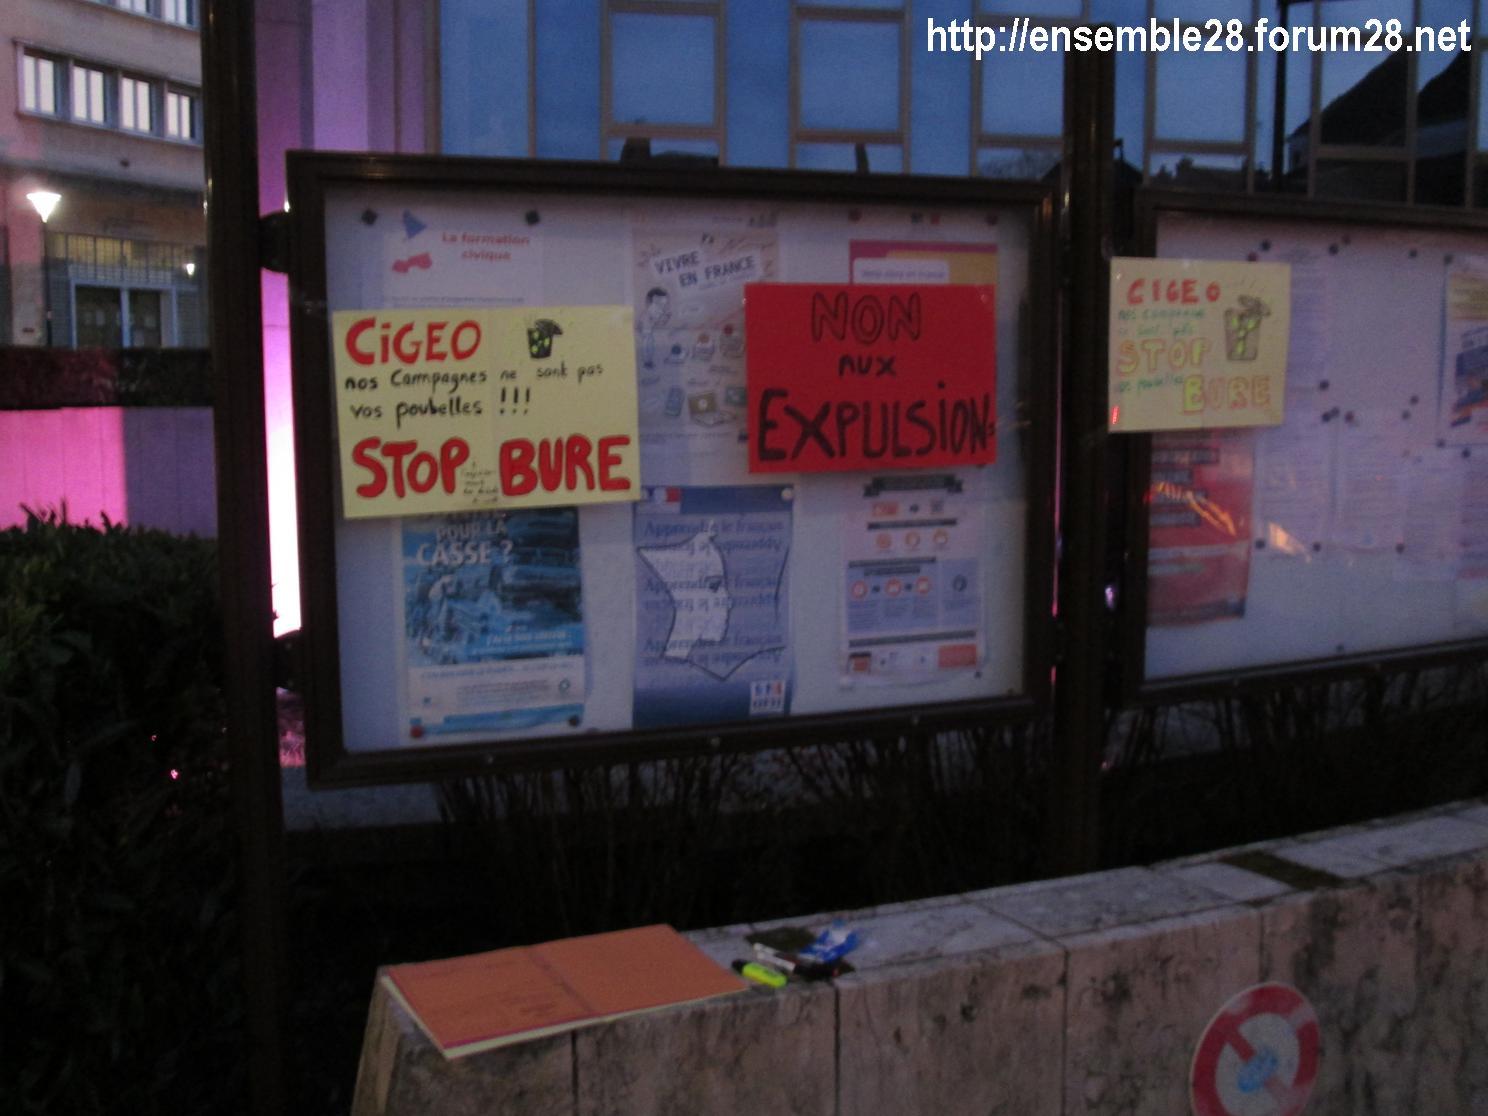 Bure Rassemblement Préfecture Chartres 22 02 2018 n°2